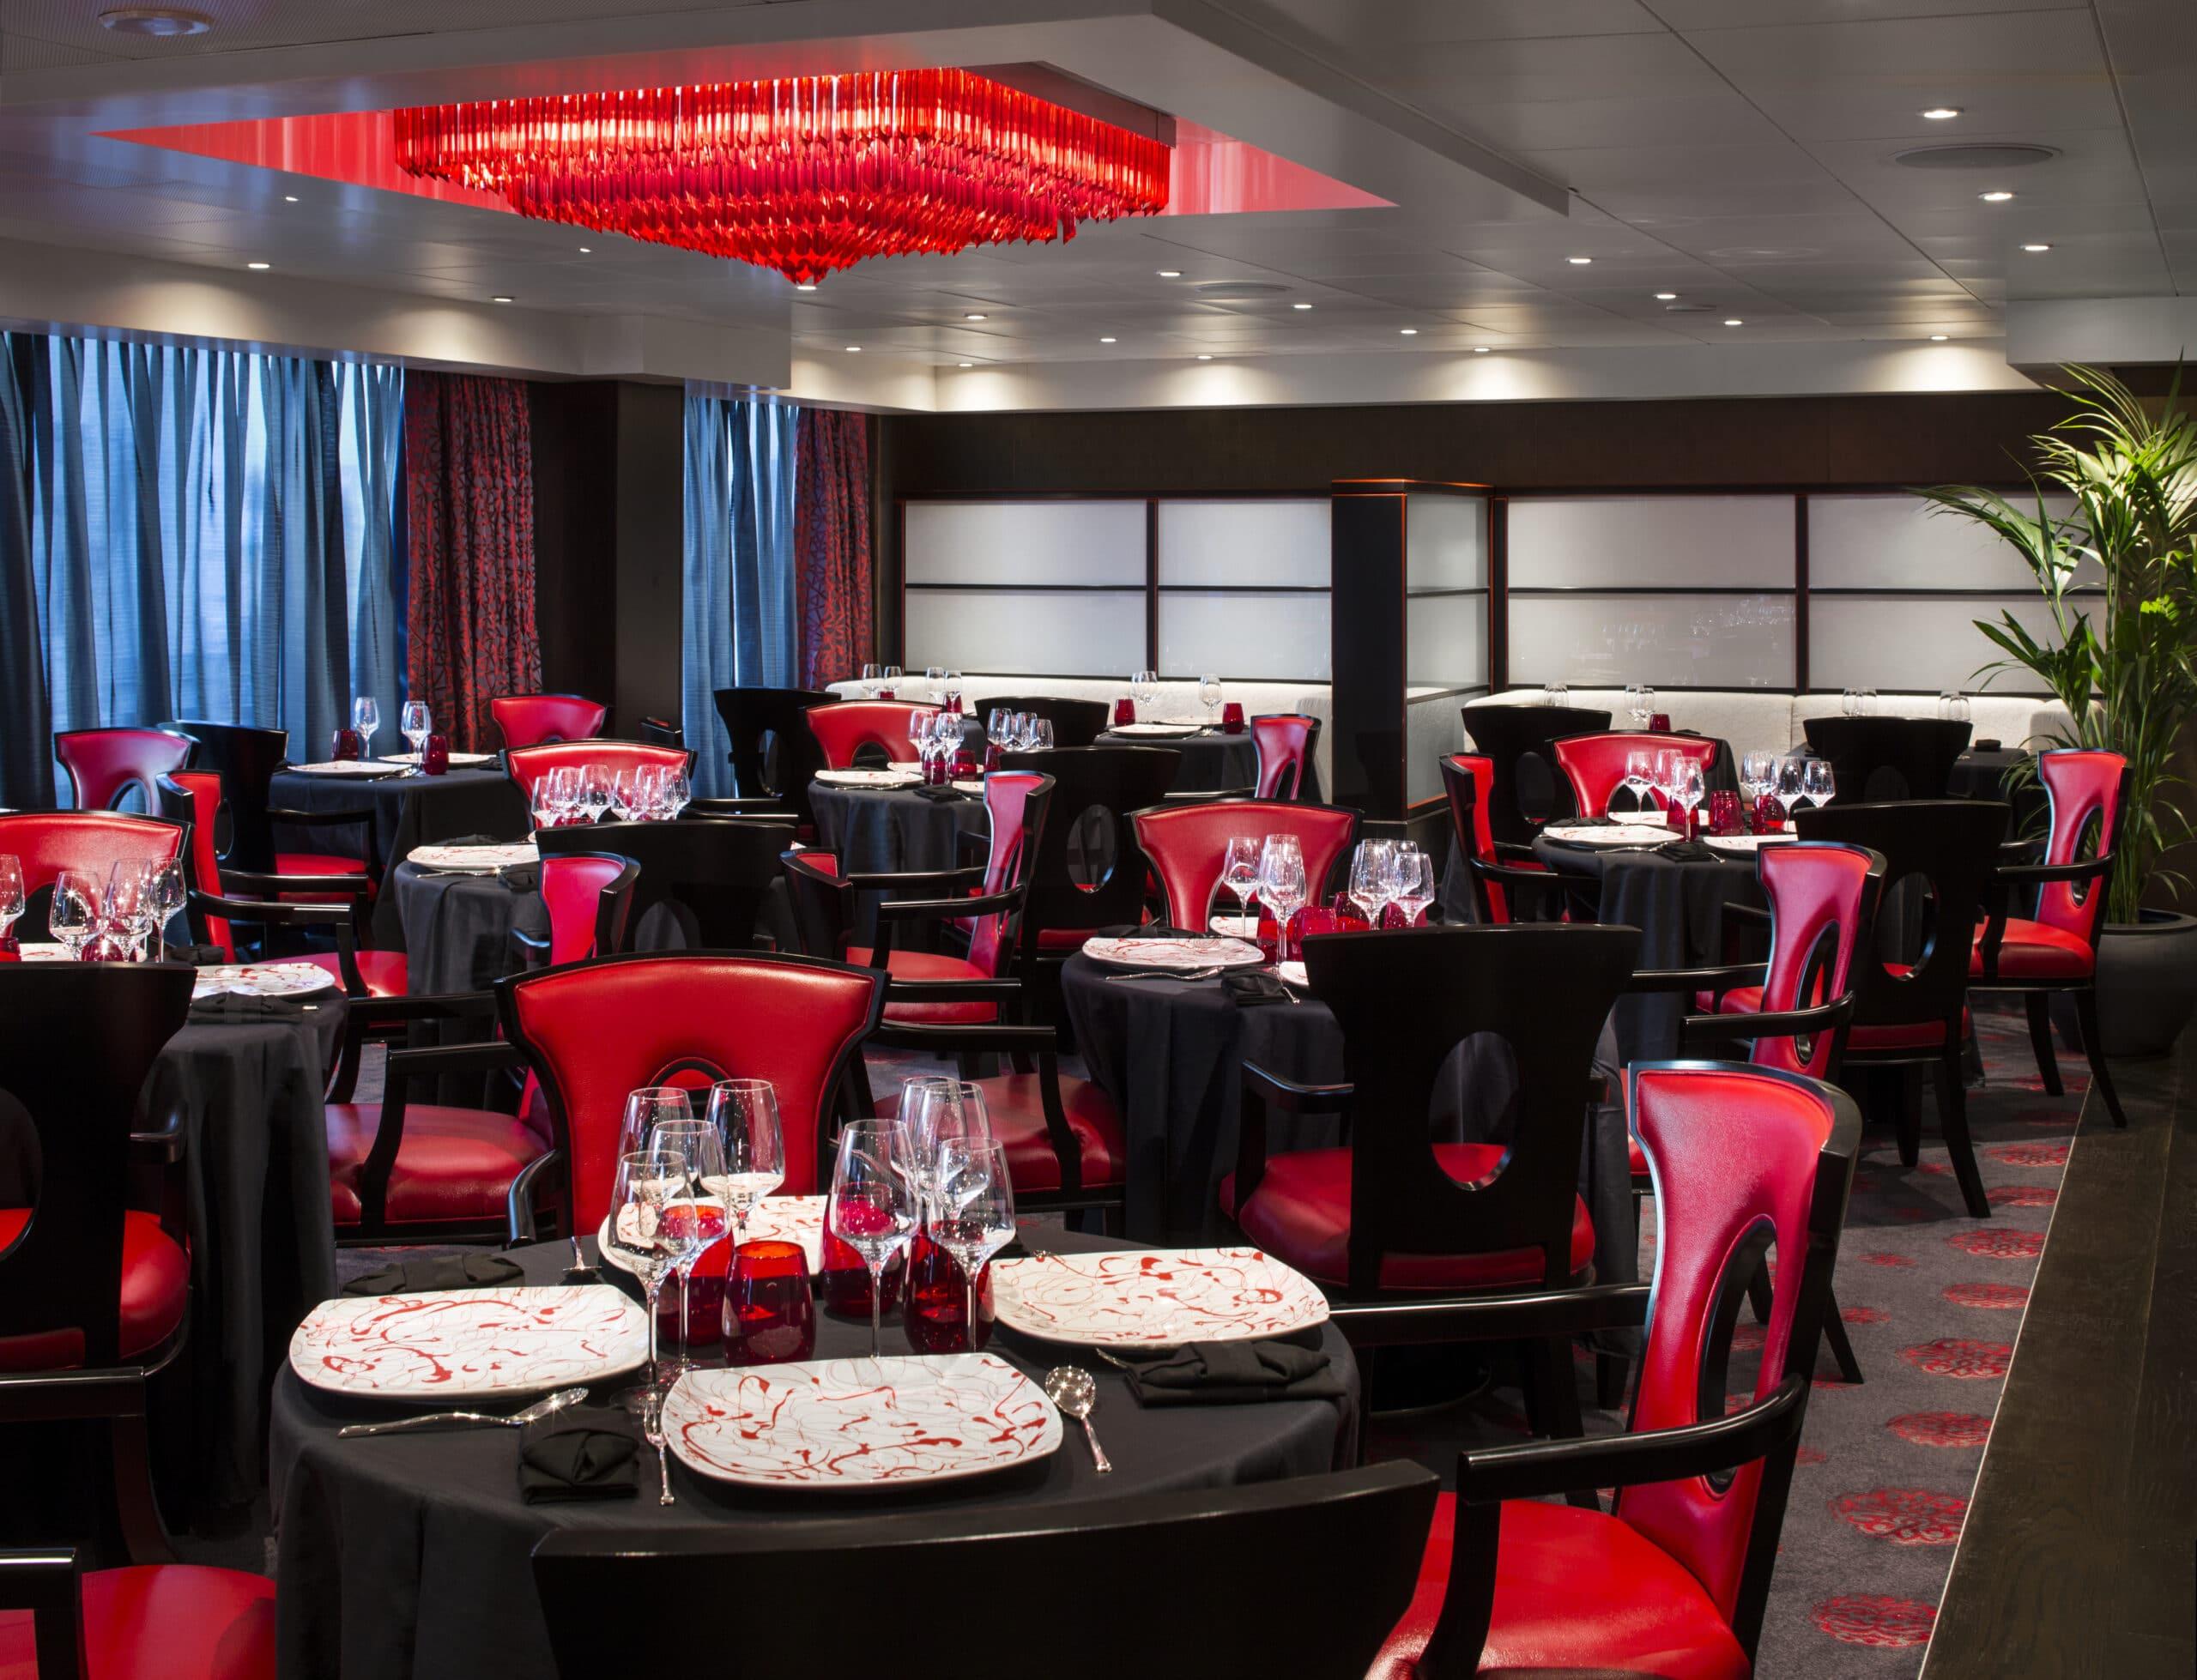 Cruiseschip-Sirena-Oceania Cruises-Restaurant Red Ginger